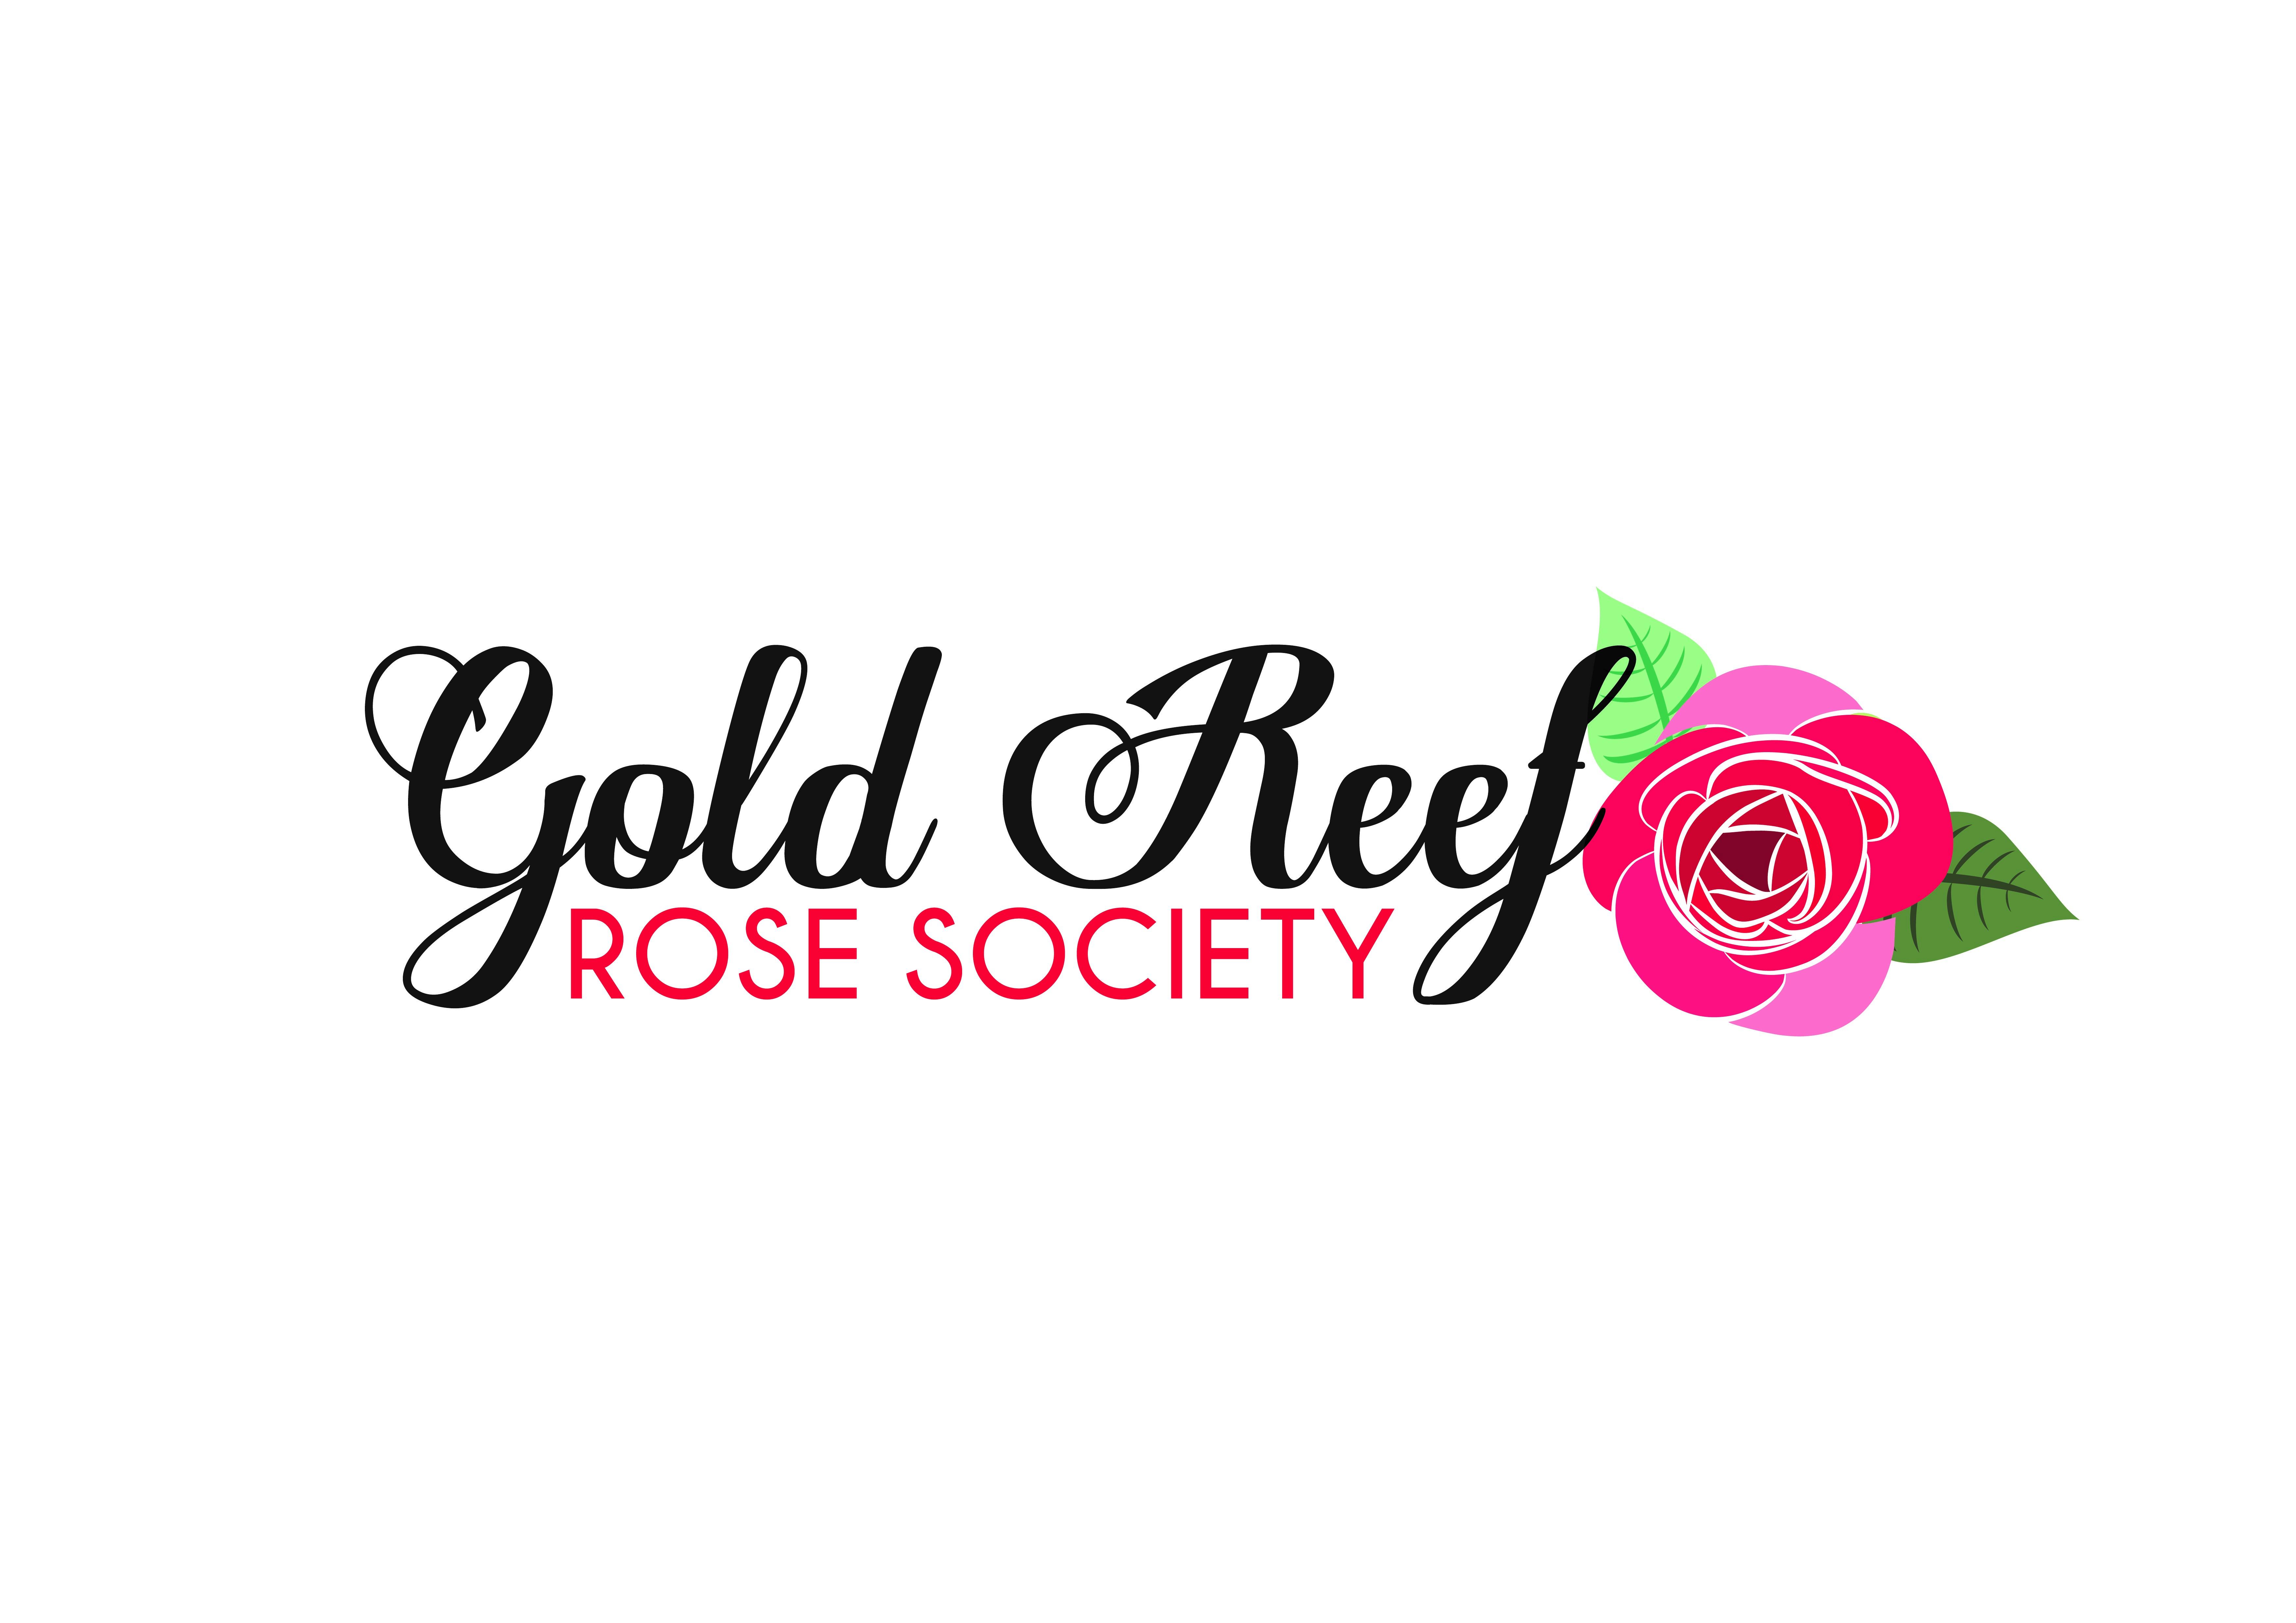 Gold Reef Rose Society logo